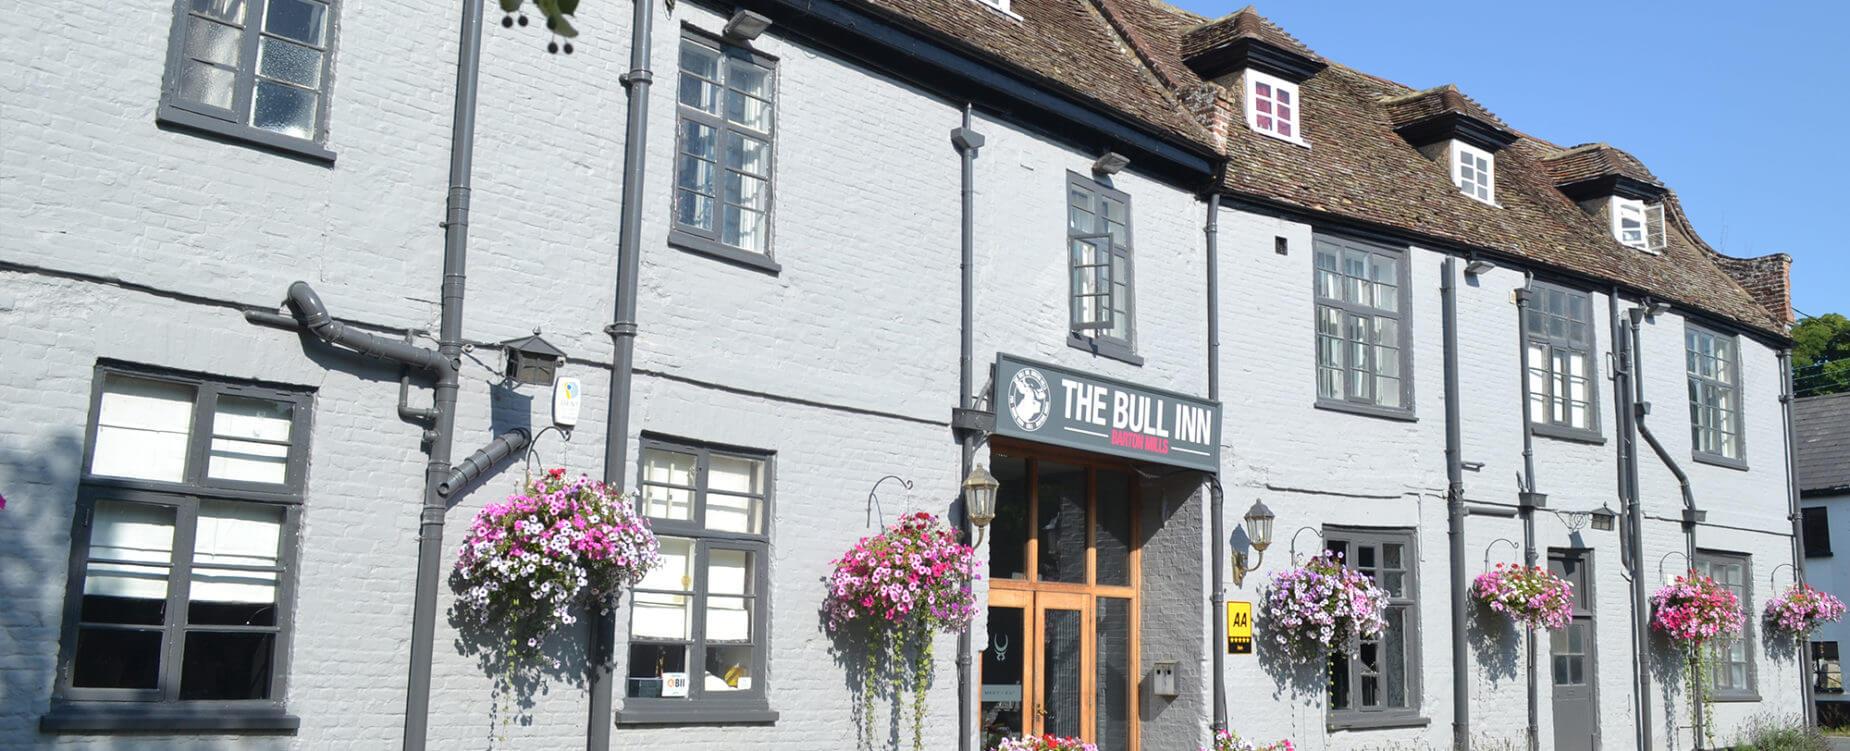 The Bull Inn, Barton Mills Suffolk   Boutique Hotel & Restaurant